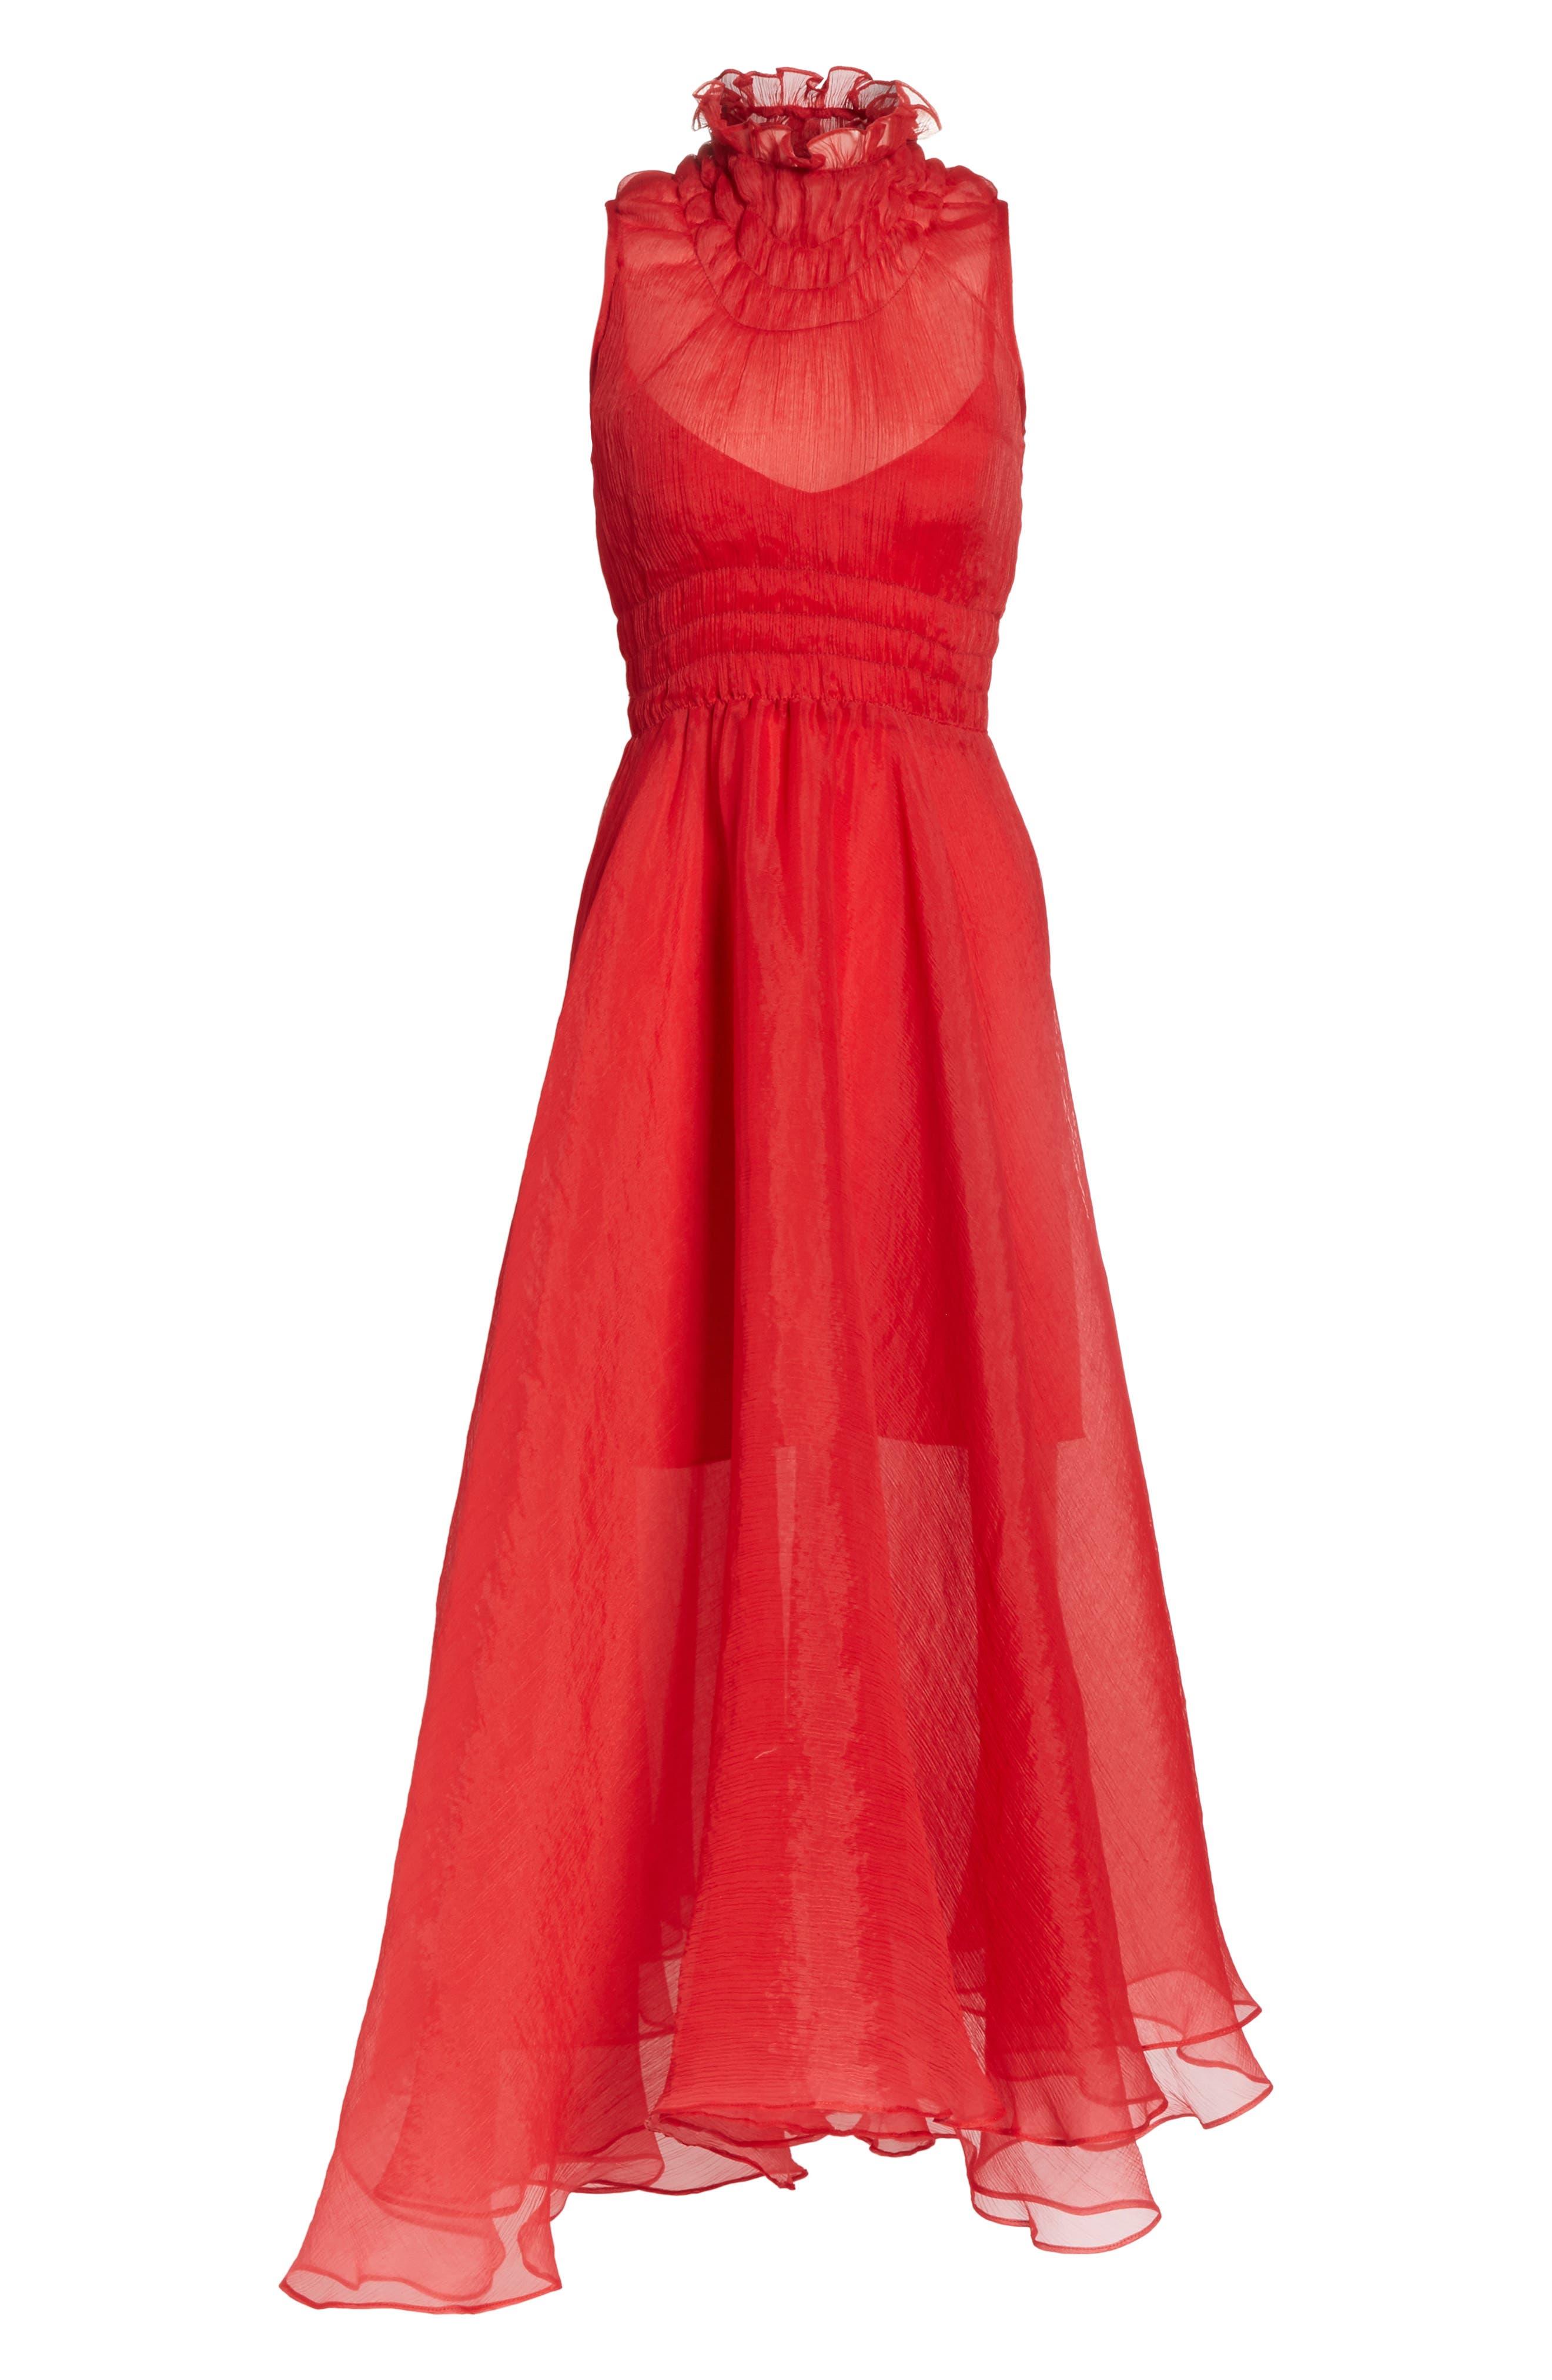 Venus Chiffon Dress,                             Alternate thumbnail 6, color,                             Red